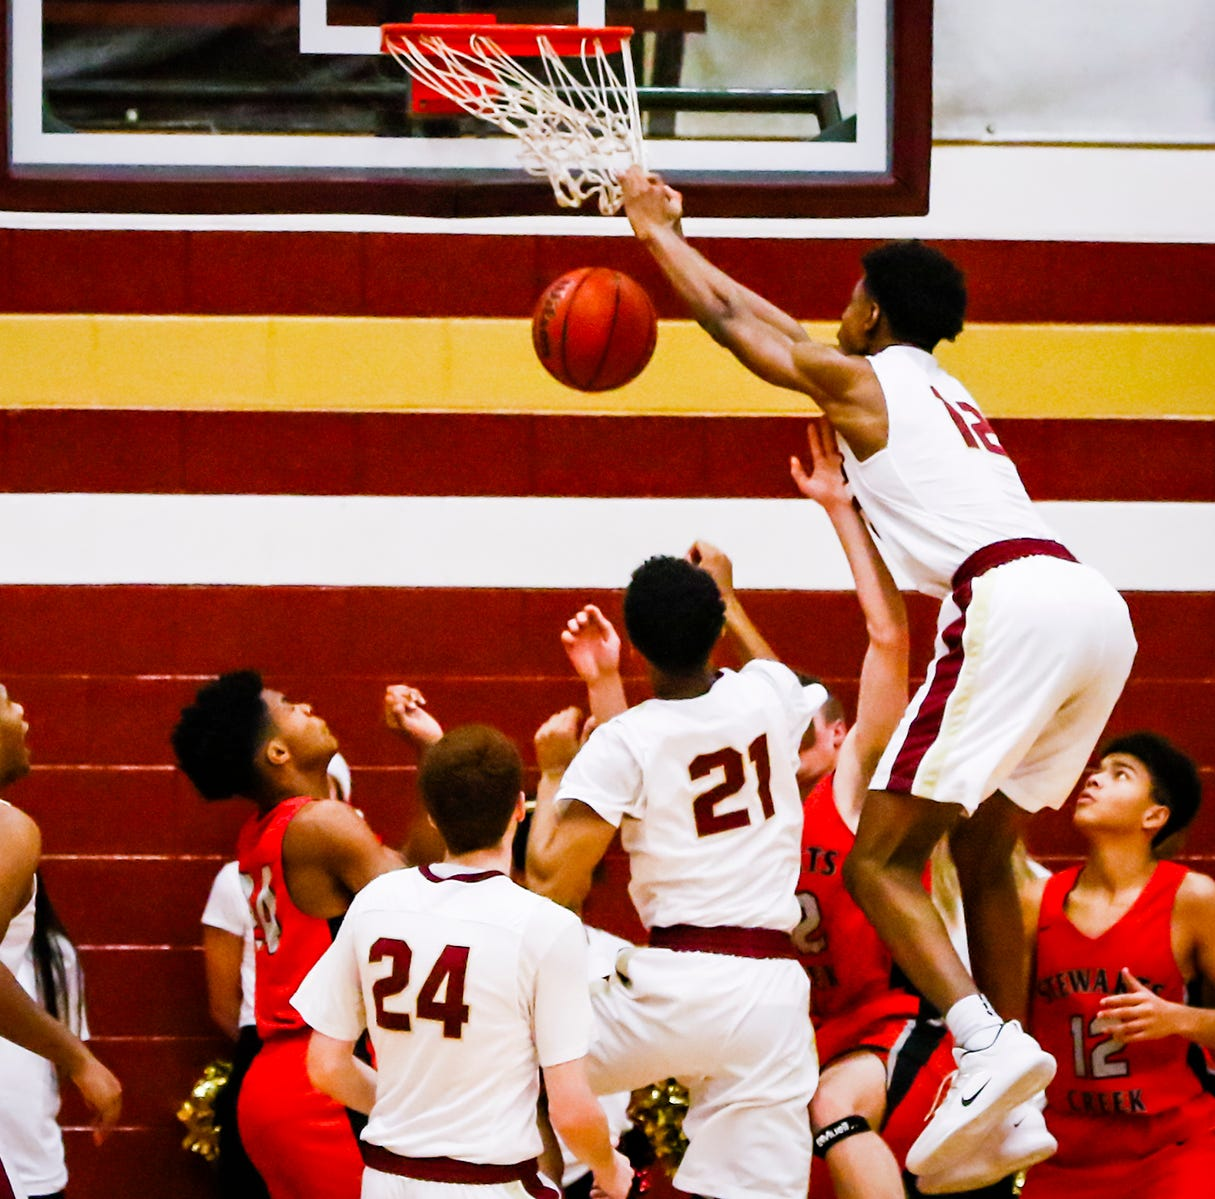 Friday's Murfreesboro area high school basketball top performers